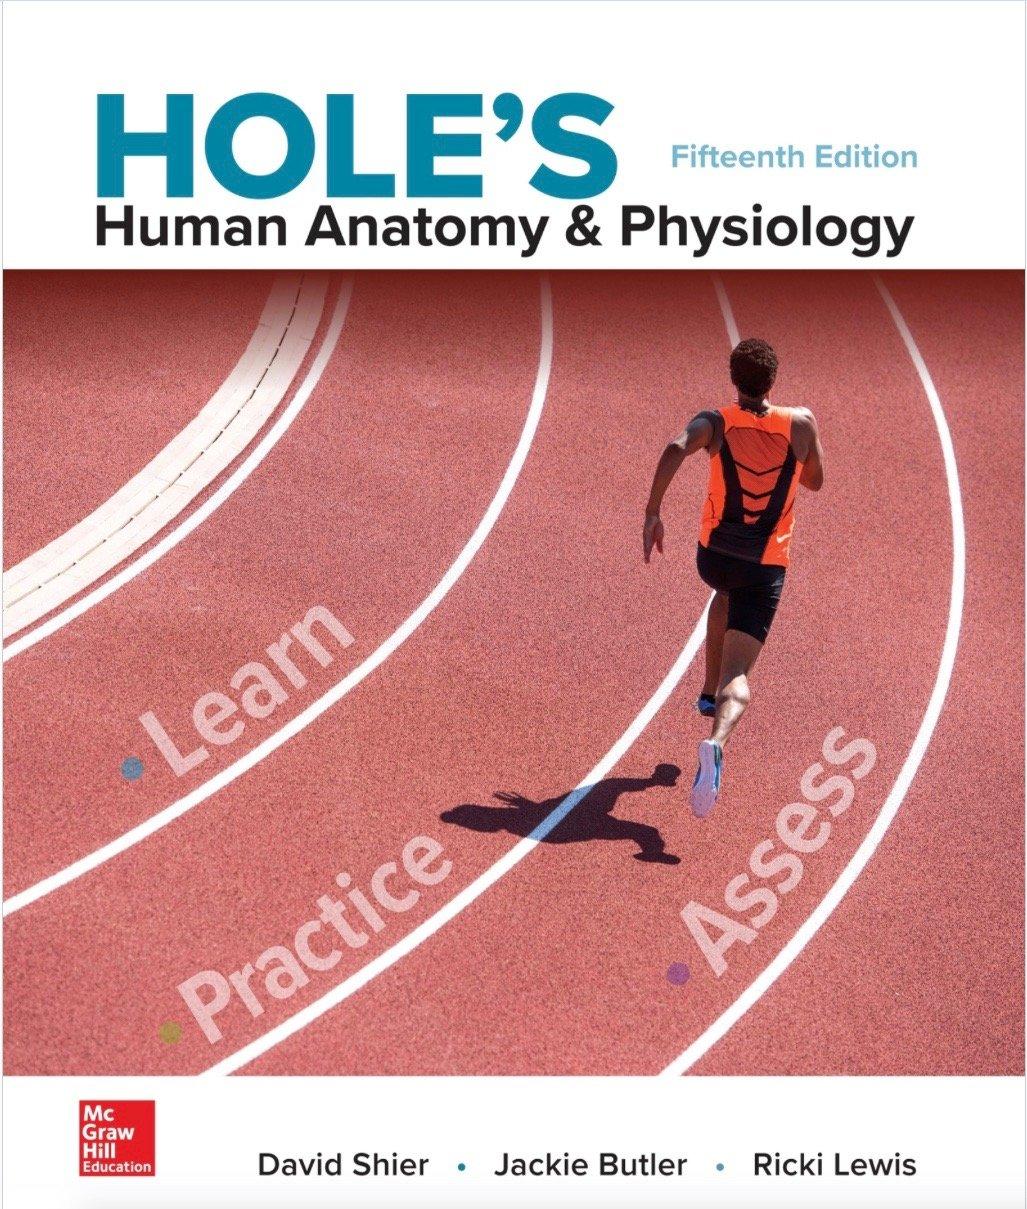 Holes Human Anatomy And Physiology David Shier Jackie Butler